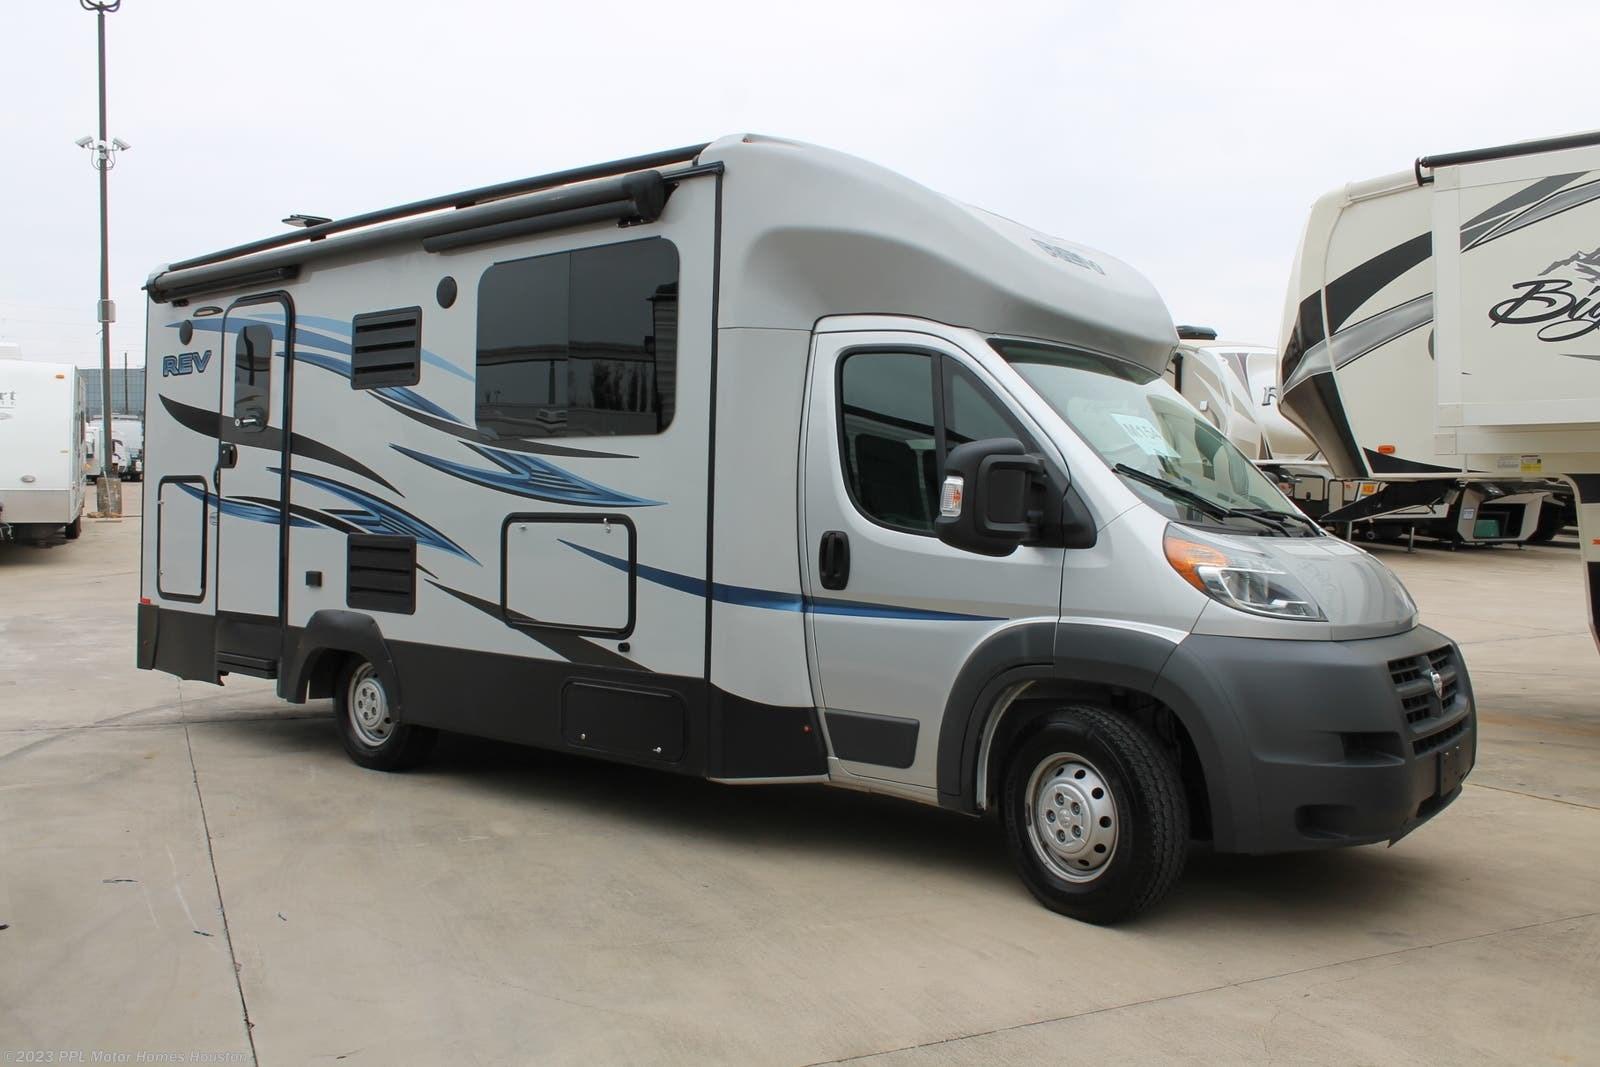 Used Rv Houston >> 2015 Dynamax Corp Rv Rev 24rb For Sale In Houston Tx 77074 M154